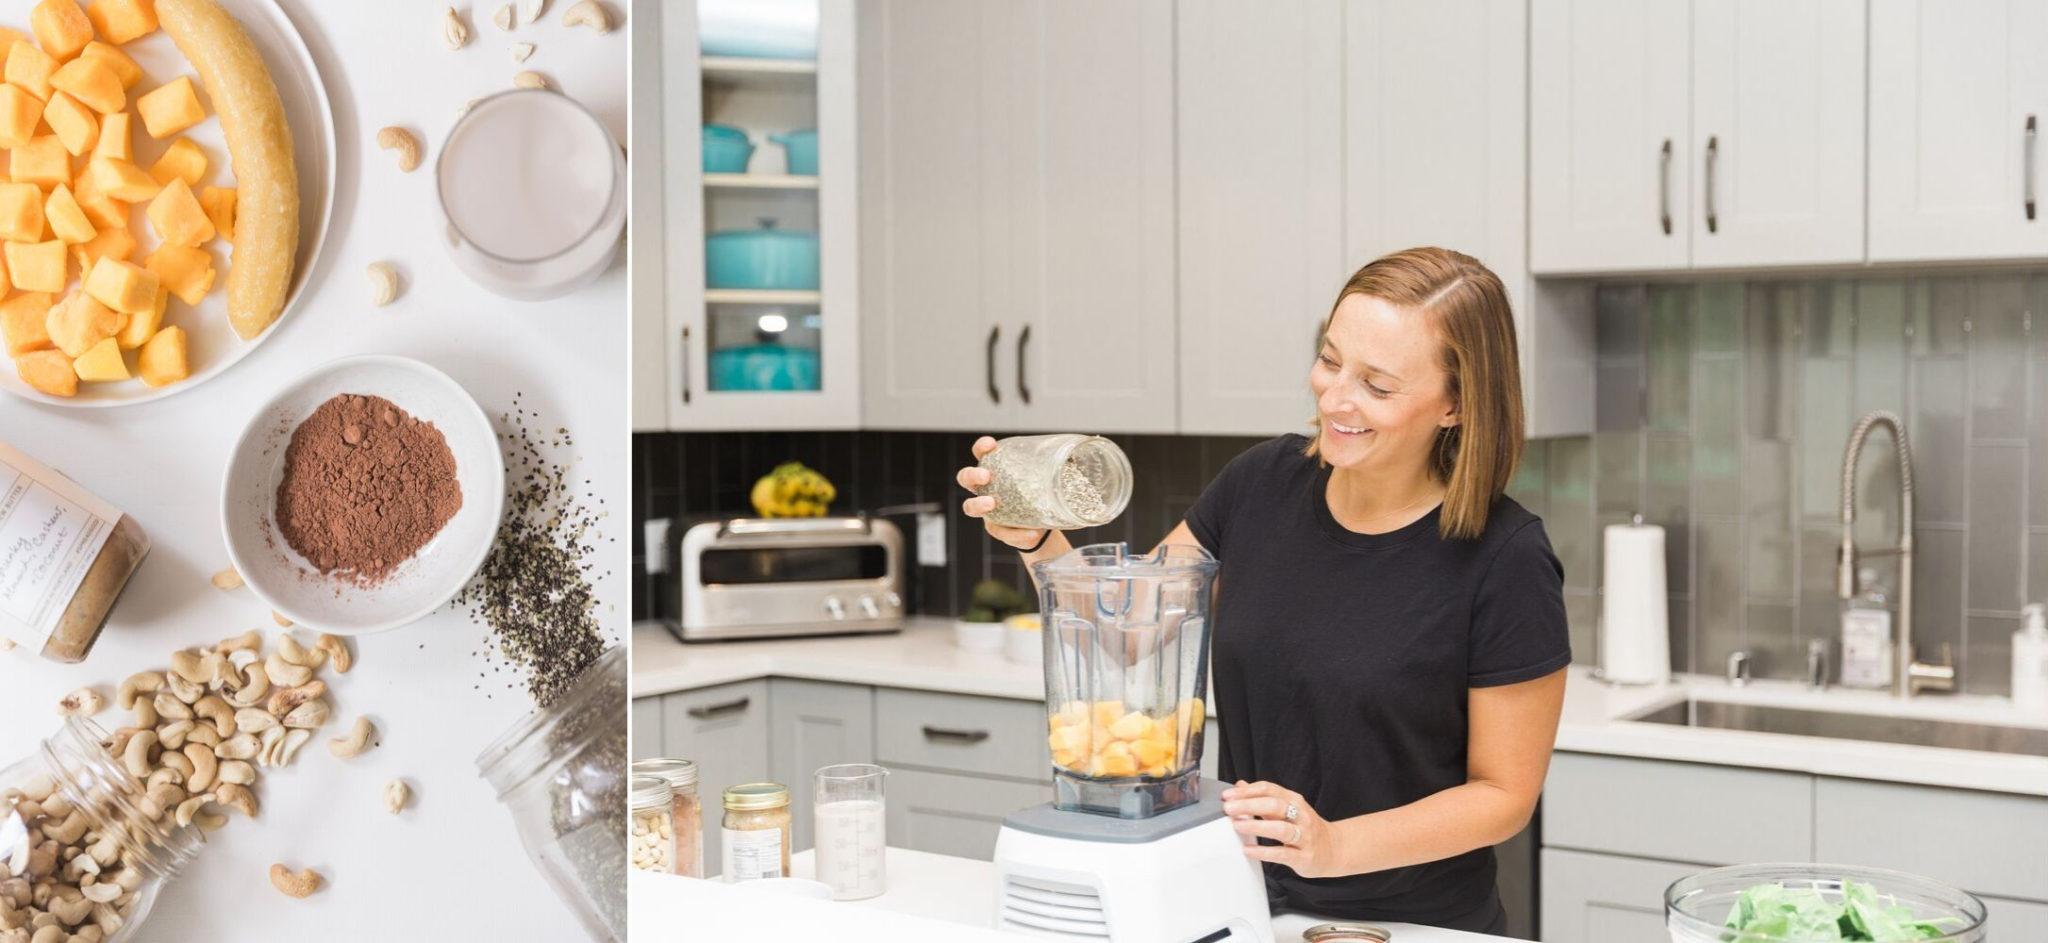 What's Gaby Cooking Mango Smoothie Recipe